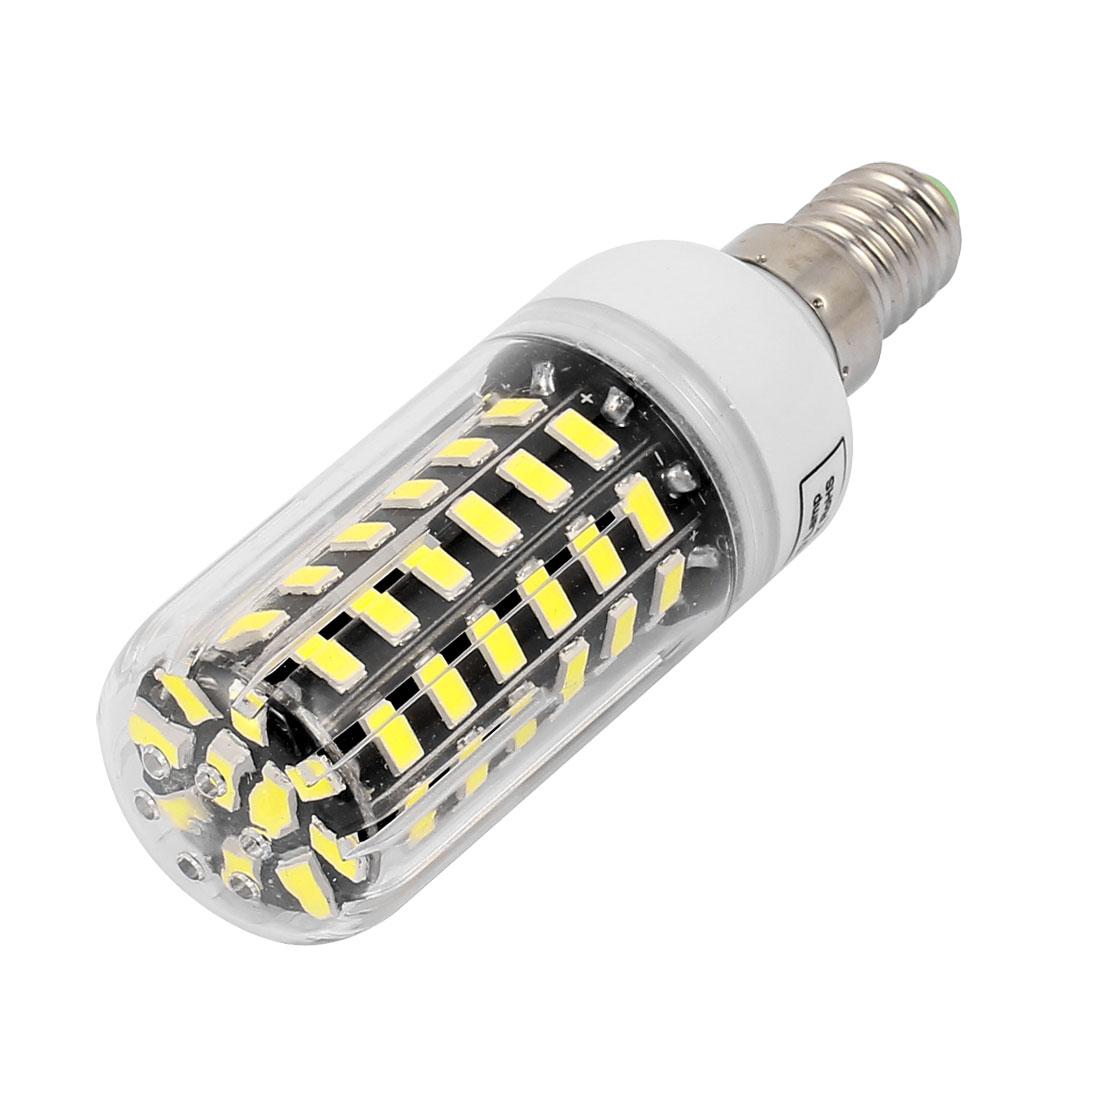 AC220V 7W 64 x 5733SMD E14 LED Corn Bulb Light Lamp Energy Saving Pure White